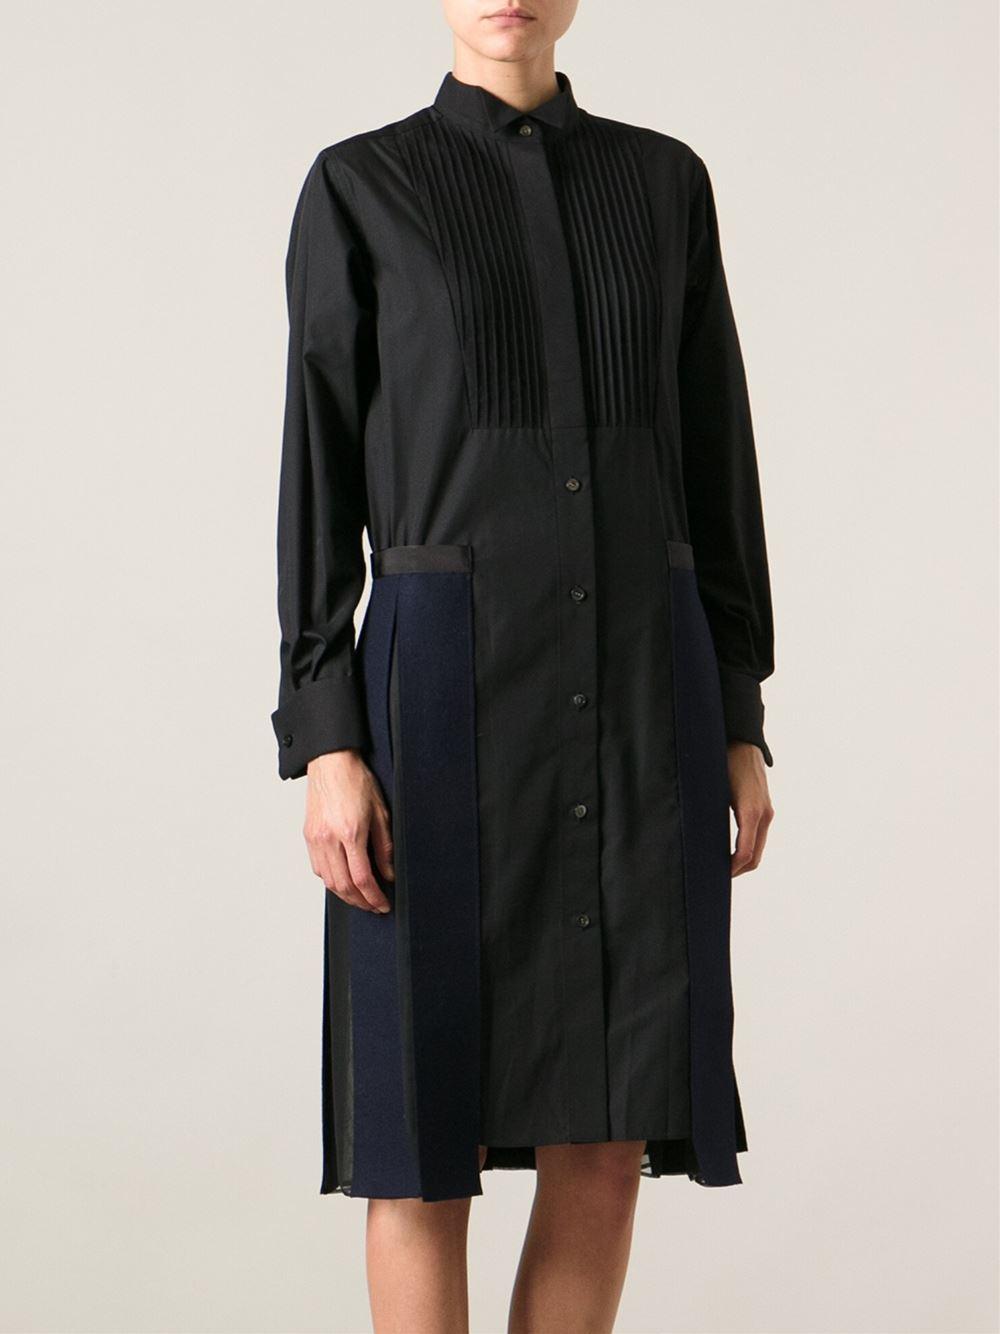 Sacai pleated shirt dress in black lyst for Black pleated dress shirt